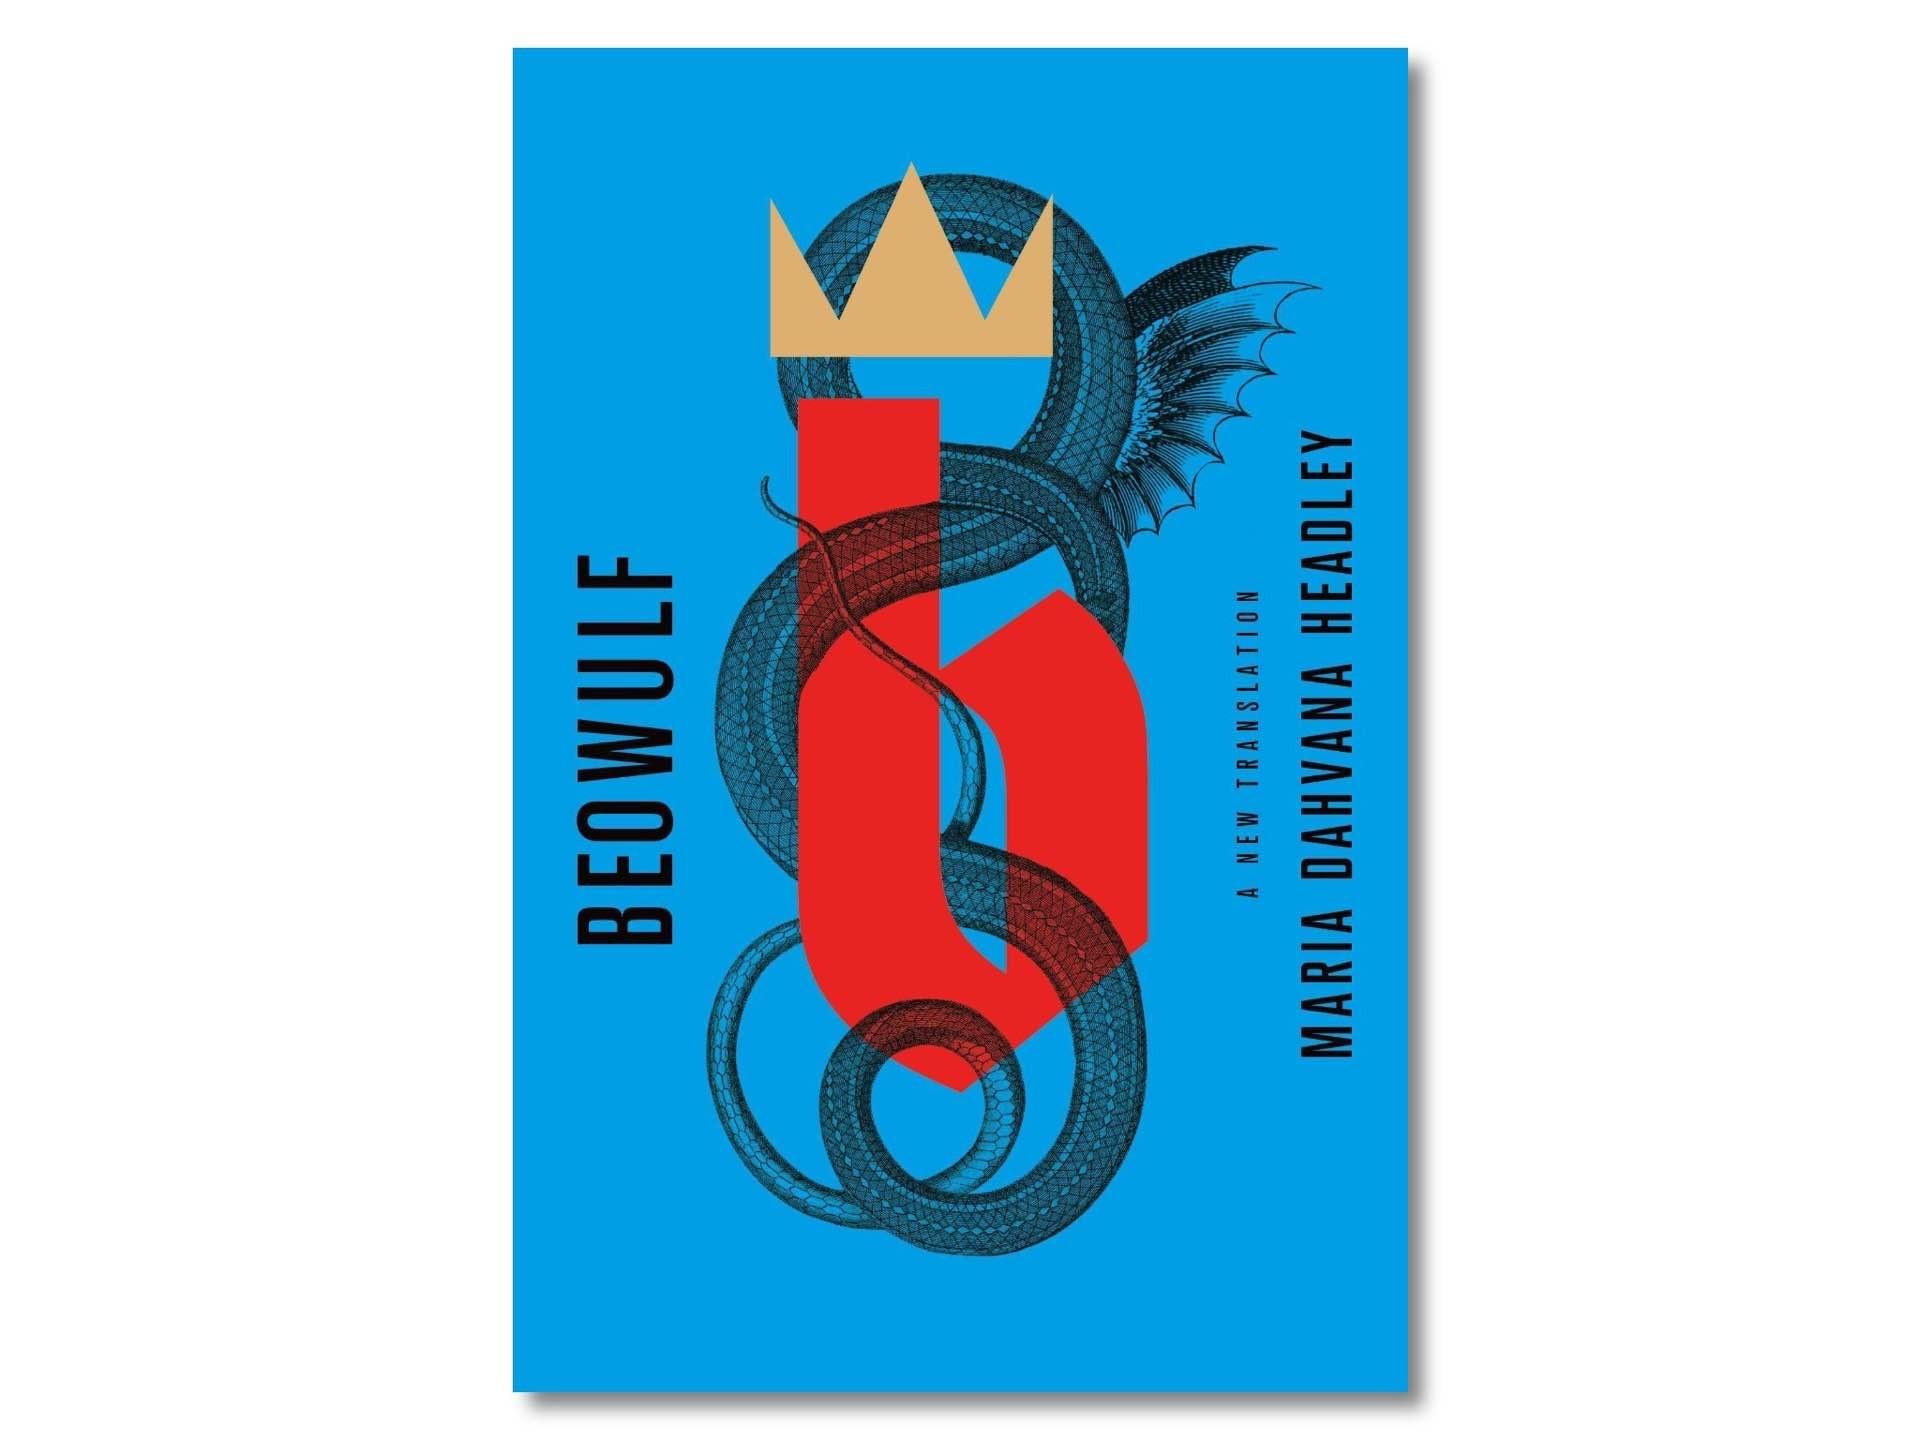 Beowulf: A New Translation by Maria Dahvana Headley. ($11 paperback)